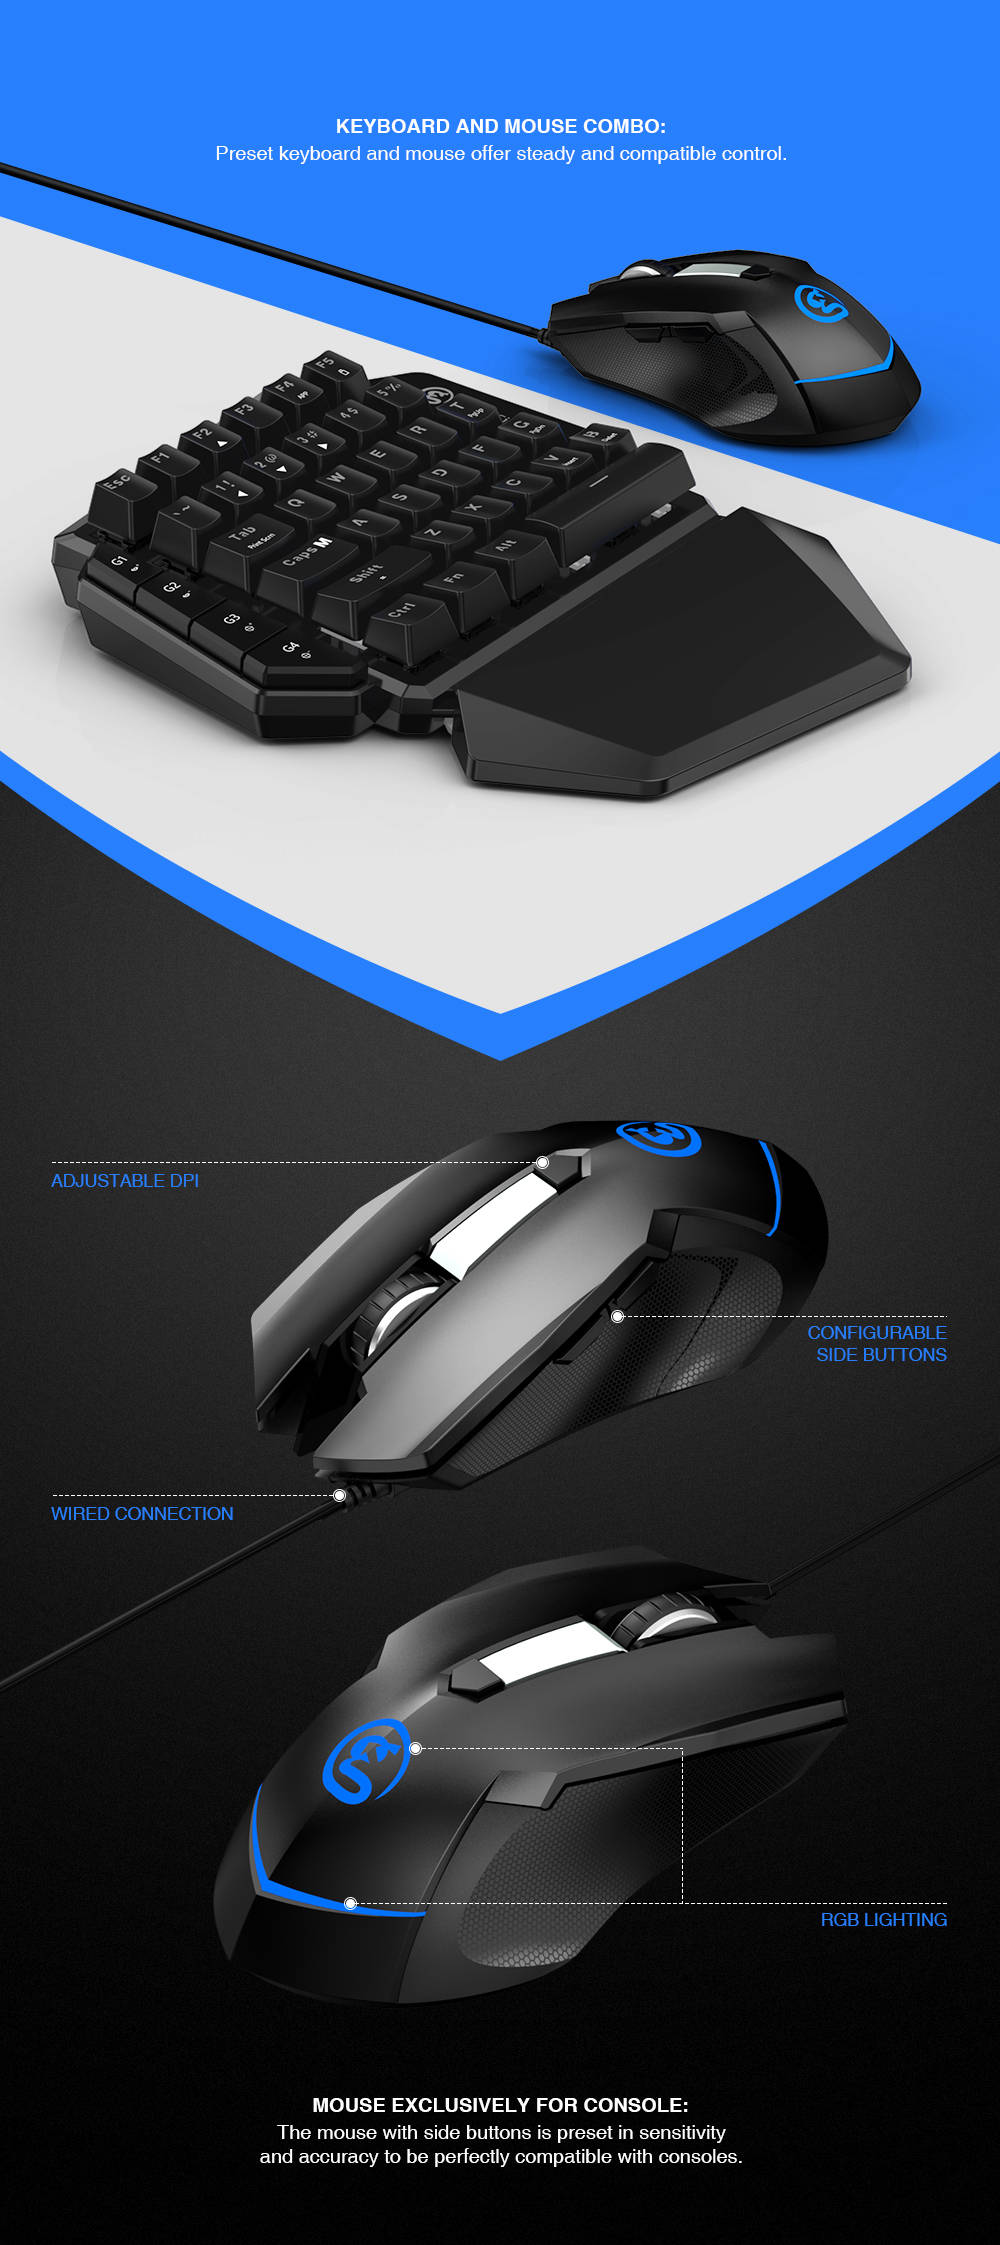 Gamesir Vx E Sports Aimswitch Wireless Keyboard Mouse Combo Black